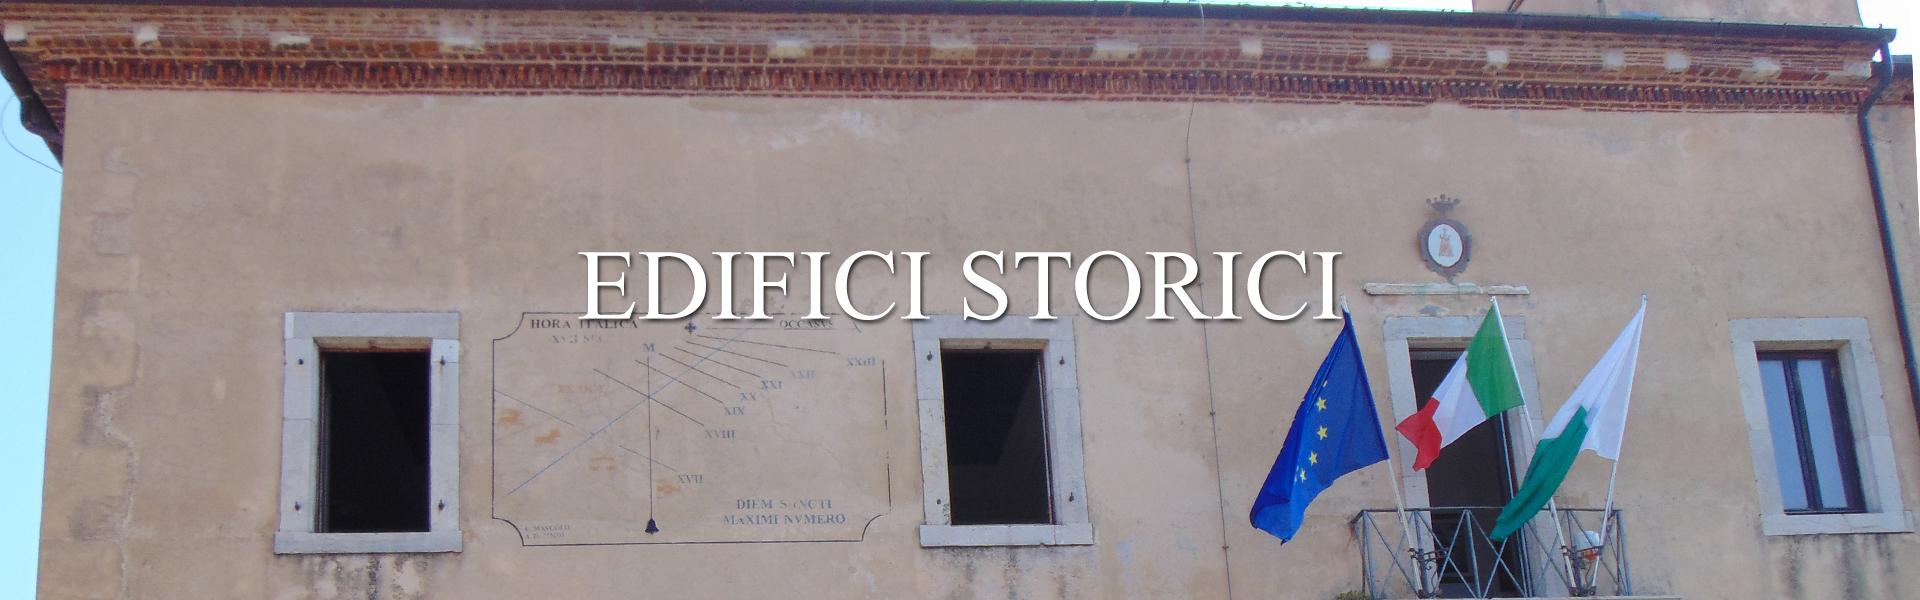 edifici-storici-1920x600